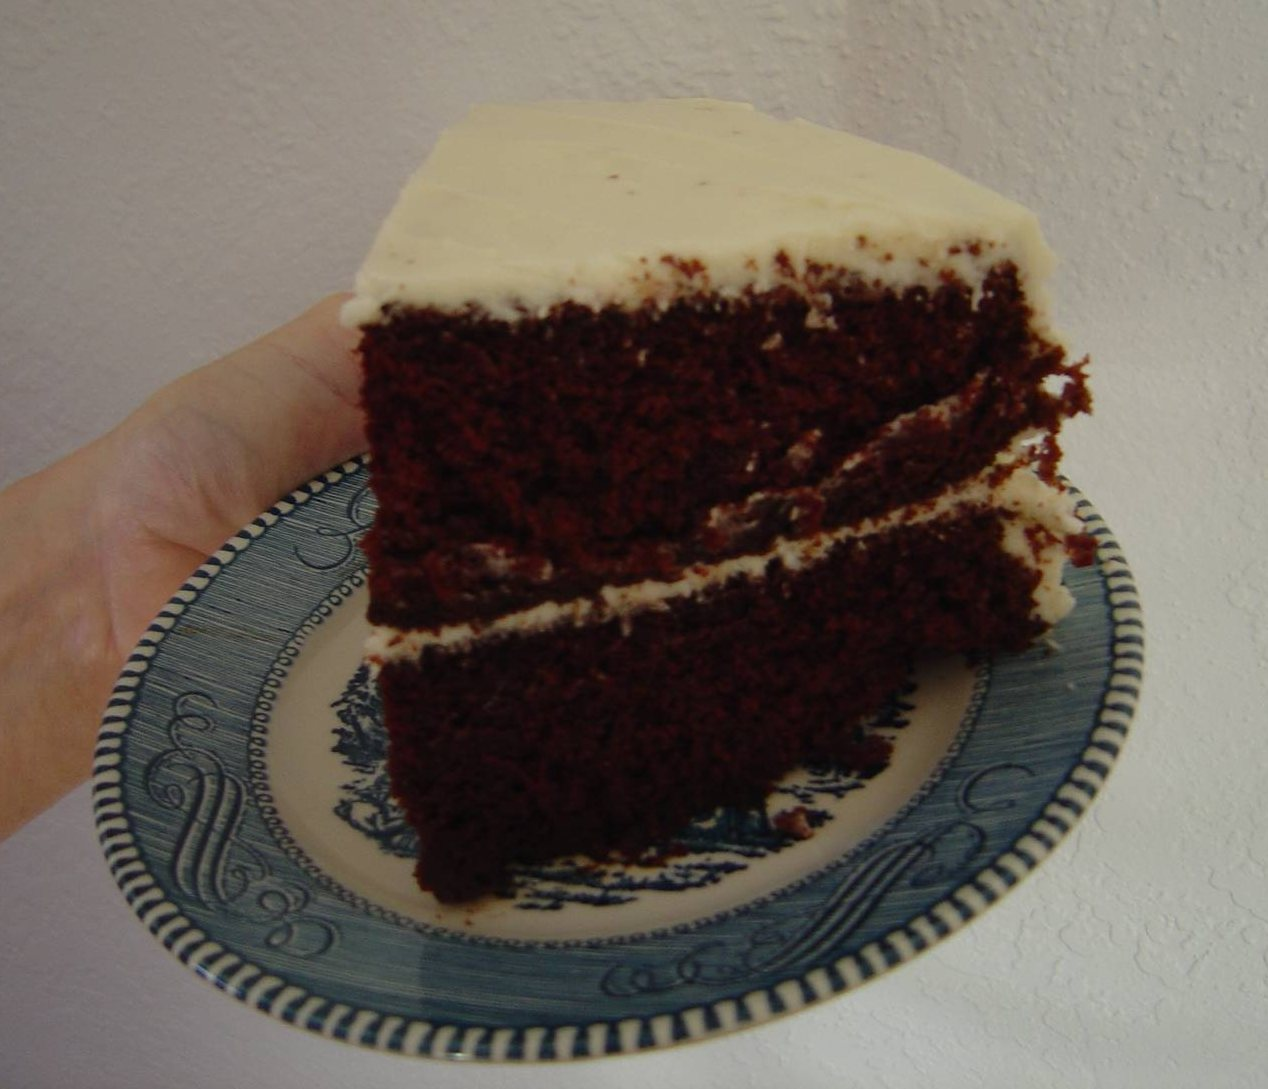 Piece of my Favorite Chocolate Cake With Hazelnut Cream icing